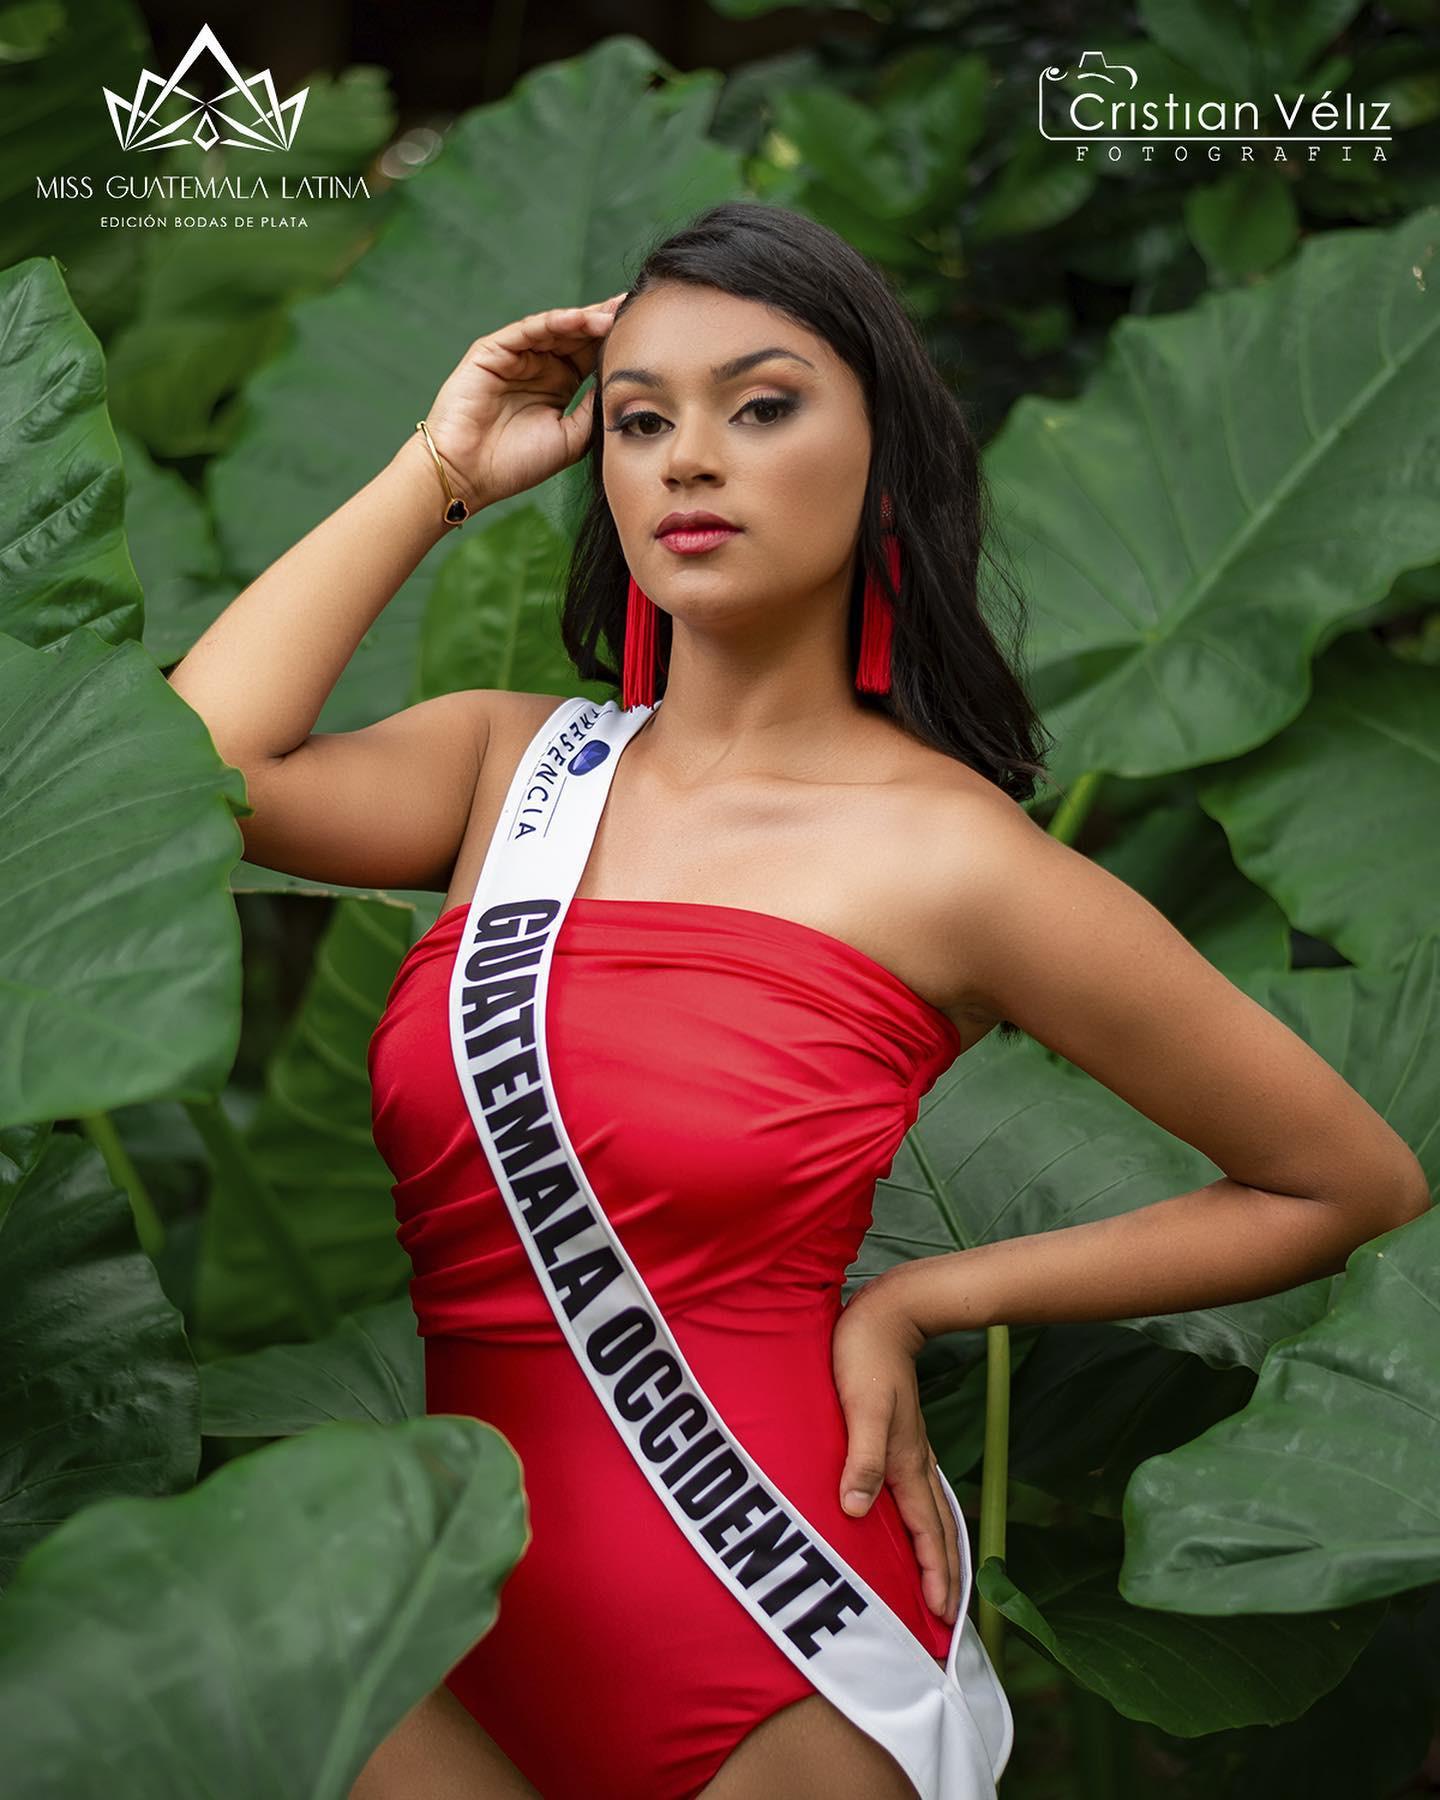 candidatas a miss guatemala latina 2021. final: 30 de abril. - Página 4 B3u3xf